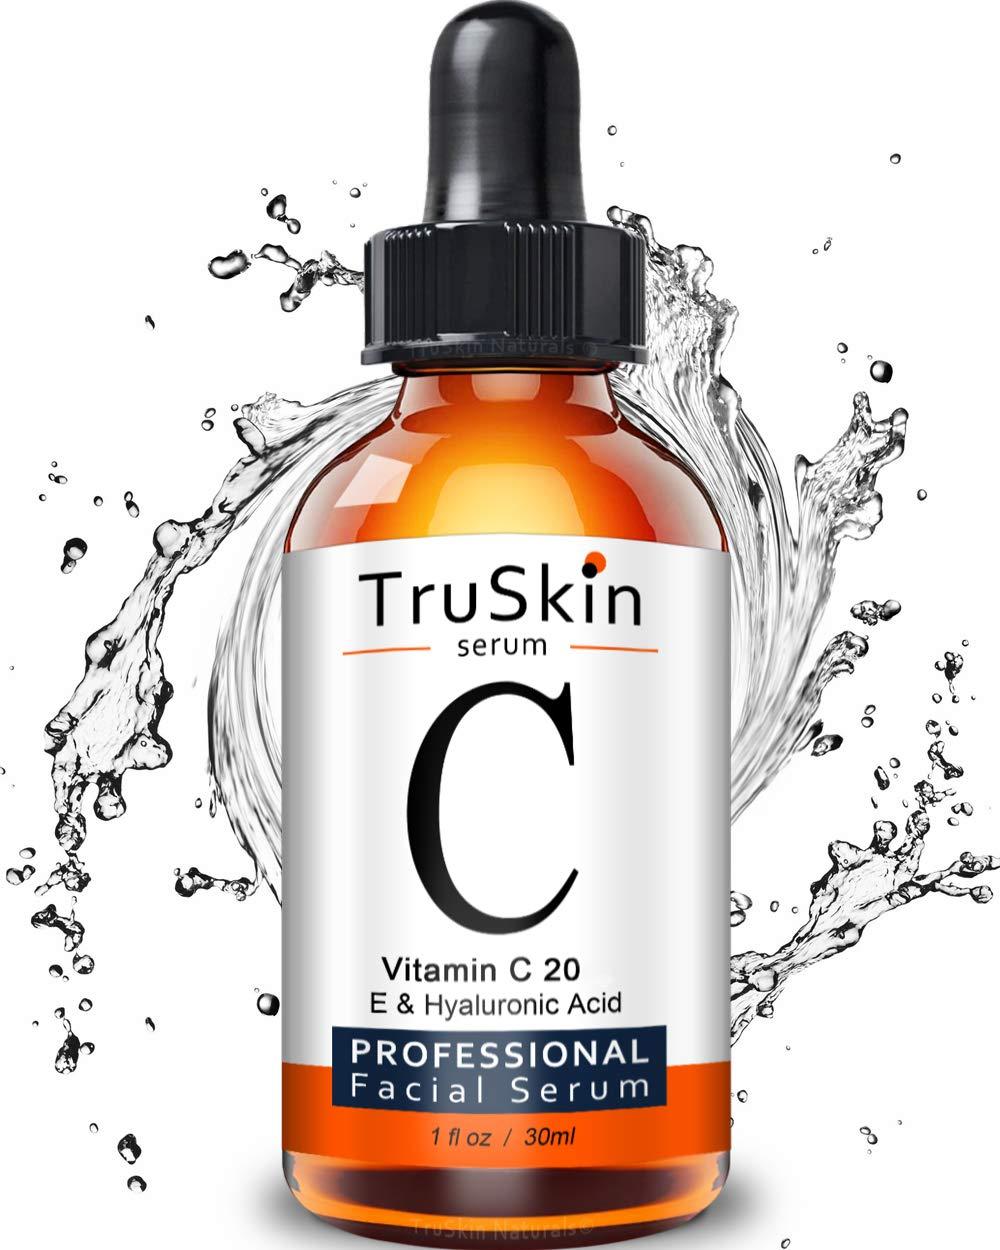 truskin vitamin c facial serum